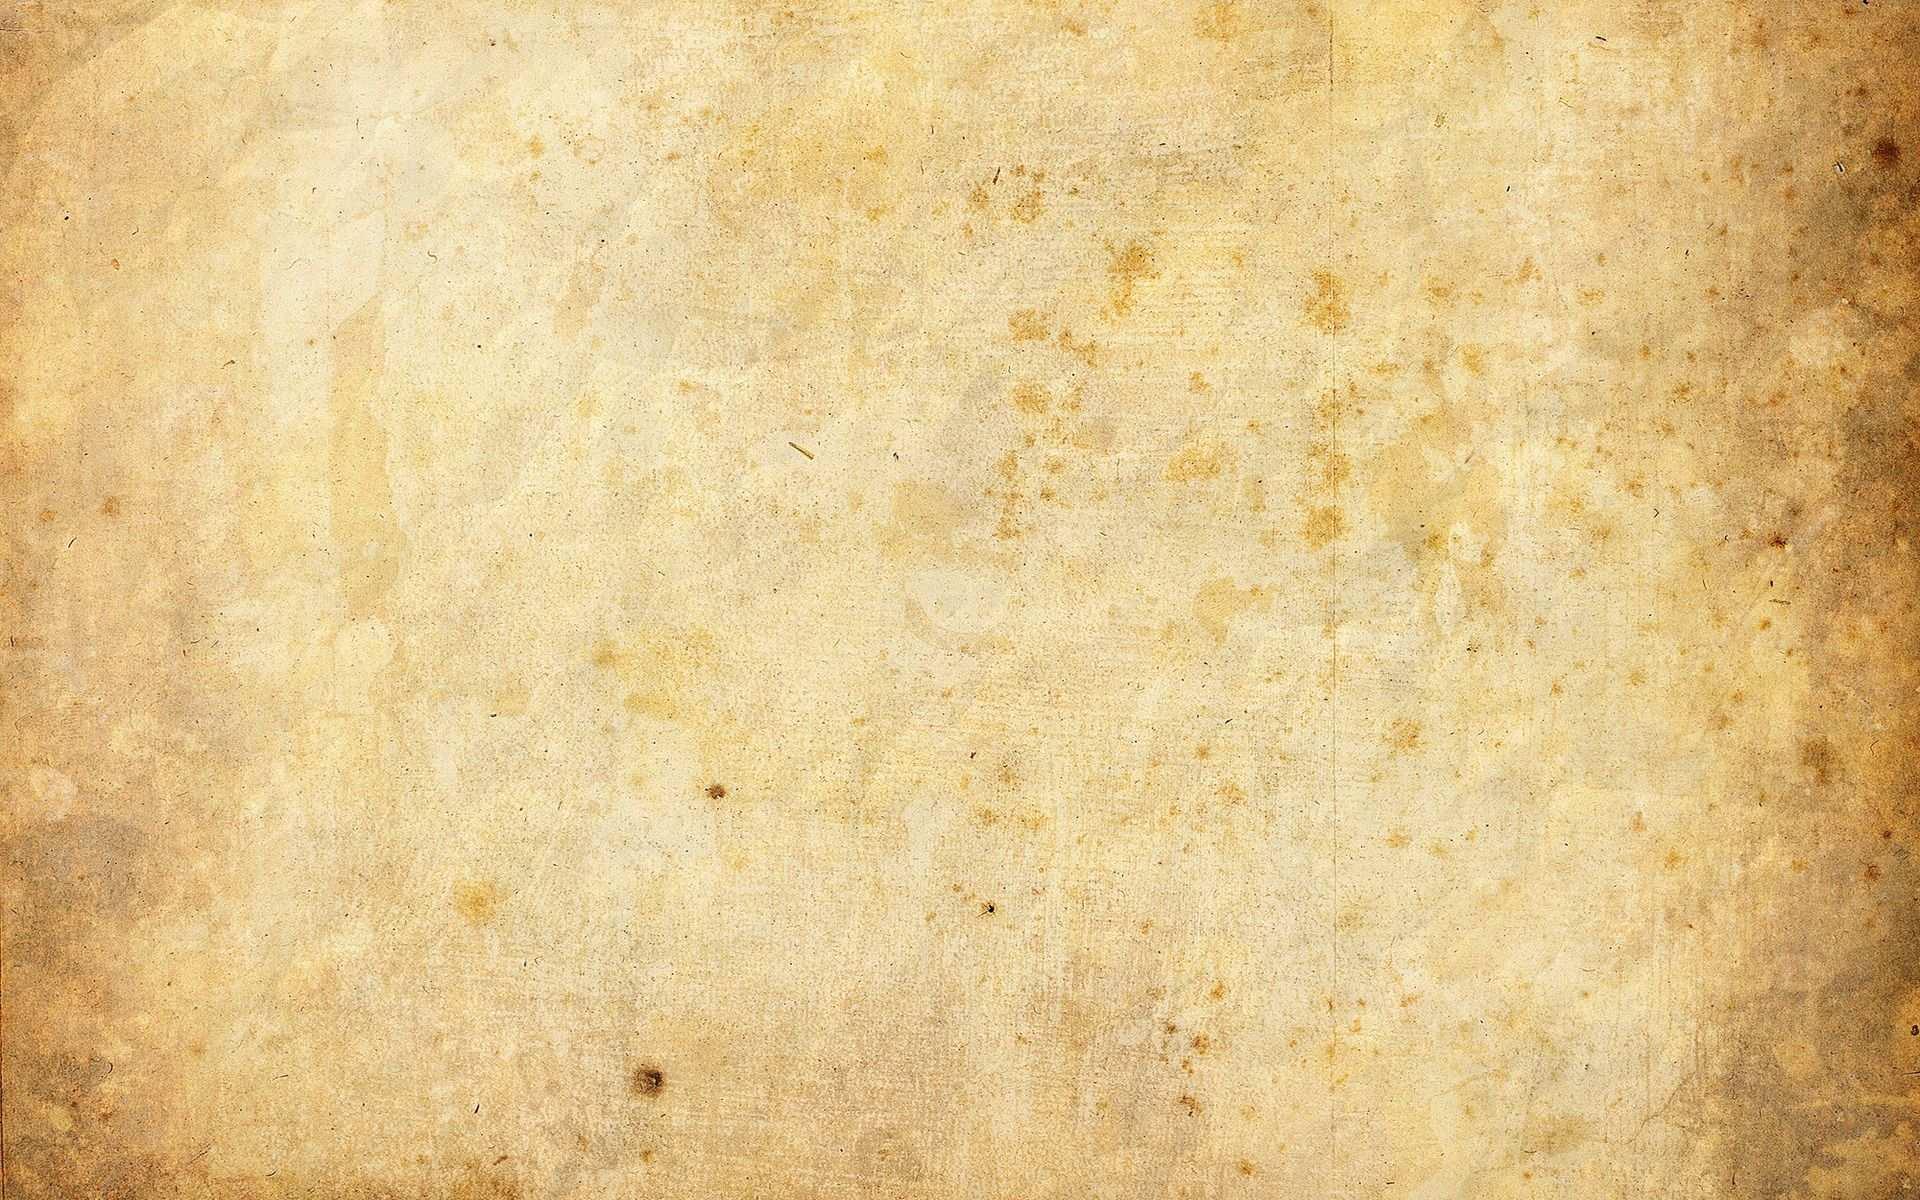 Simple Vintage Backgrounds 17271 Papier Hintergrund Altes